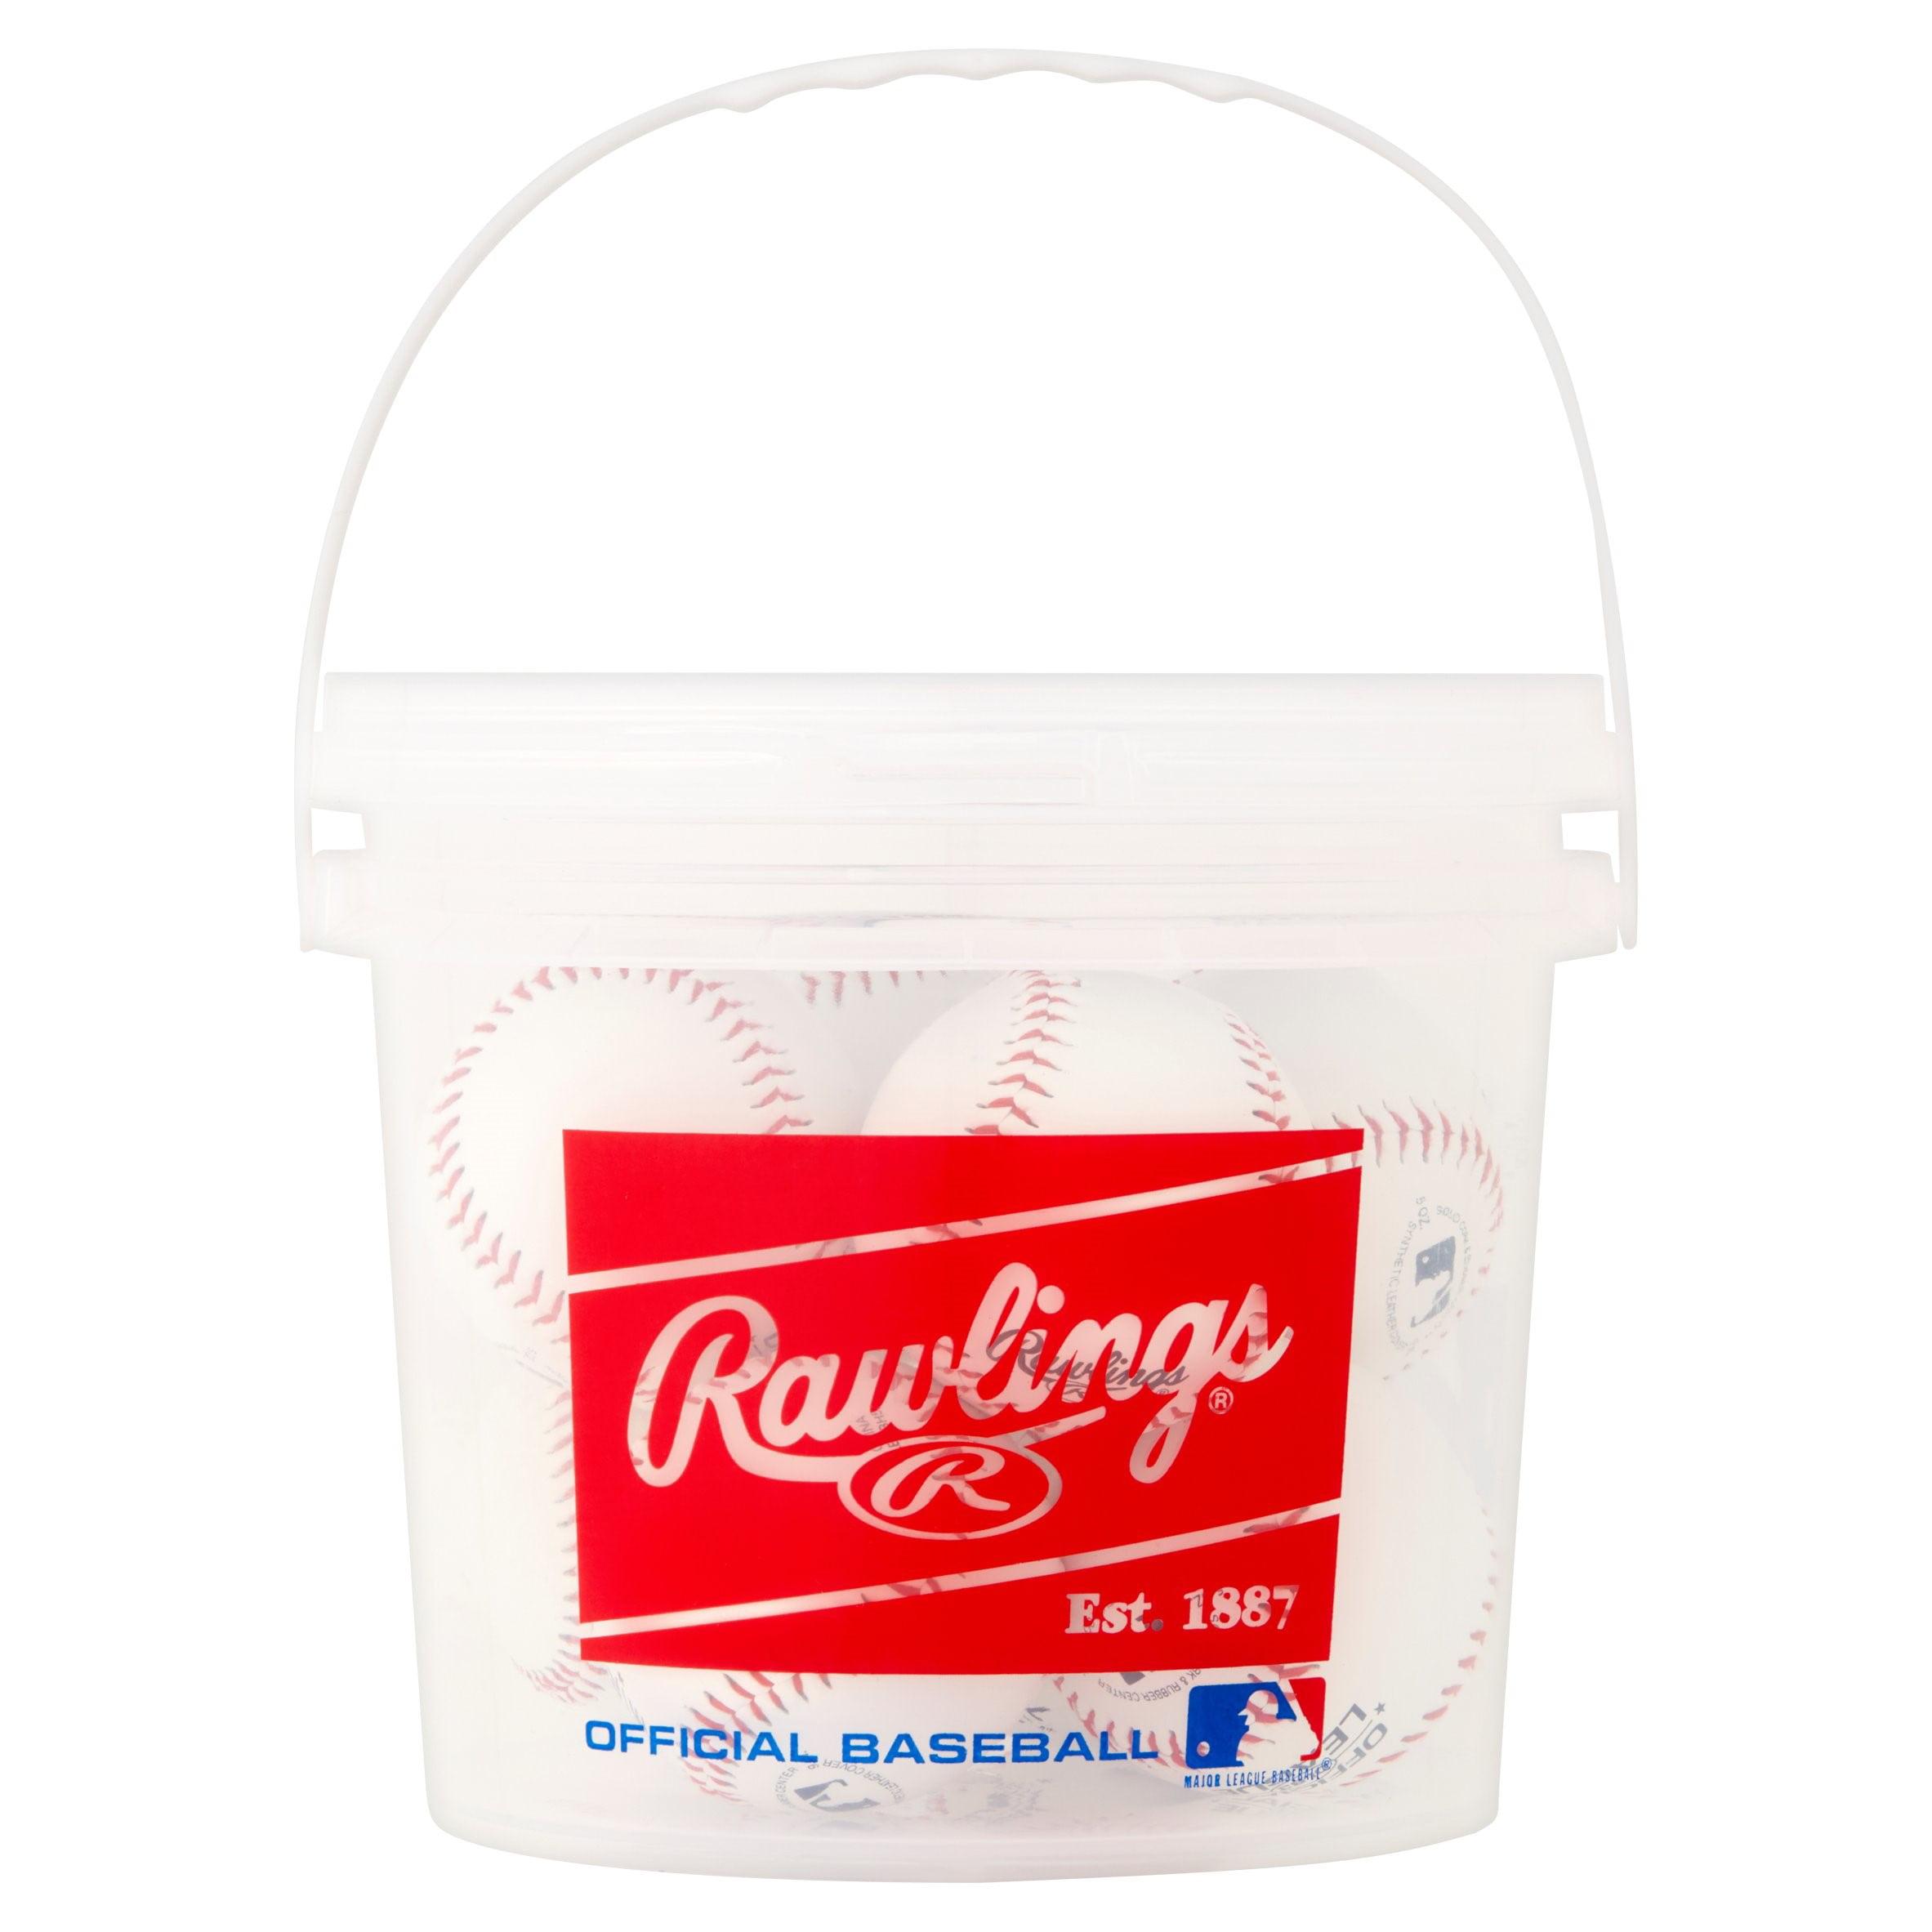 Rawlings 8 Pack Bucket of Baseballs